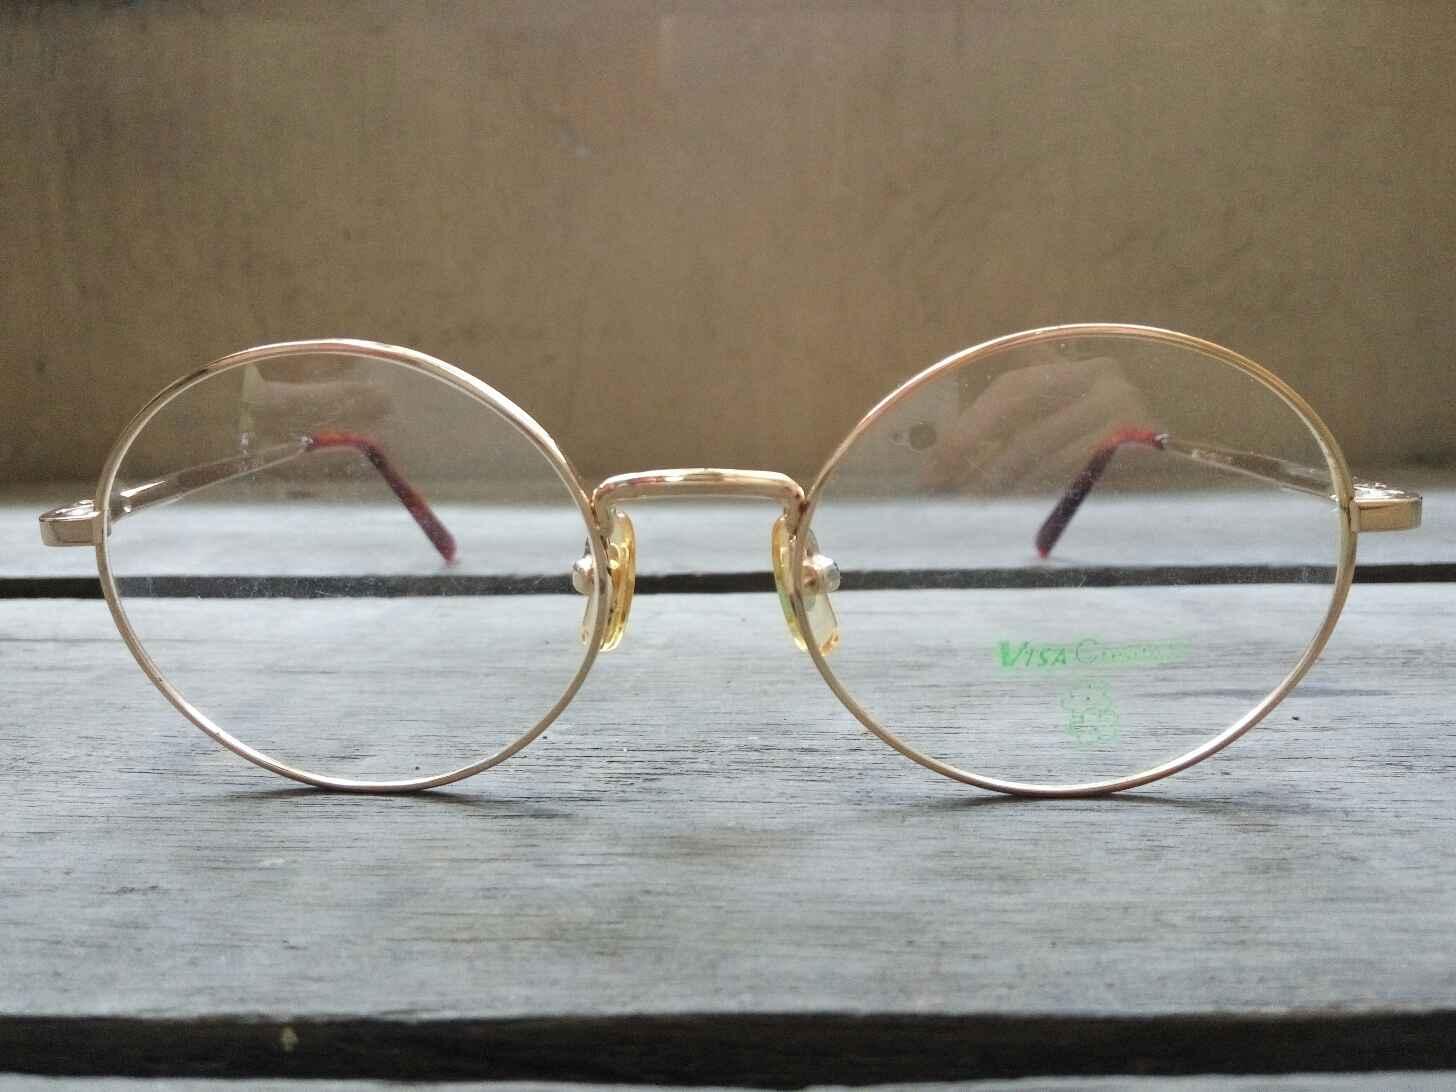 Kacamata Vintage Jadul Antik Original VISA CREATION ROUND GOLD PLATE ... 5fc20feccb